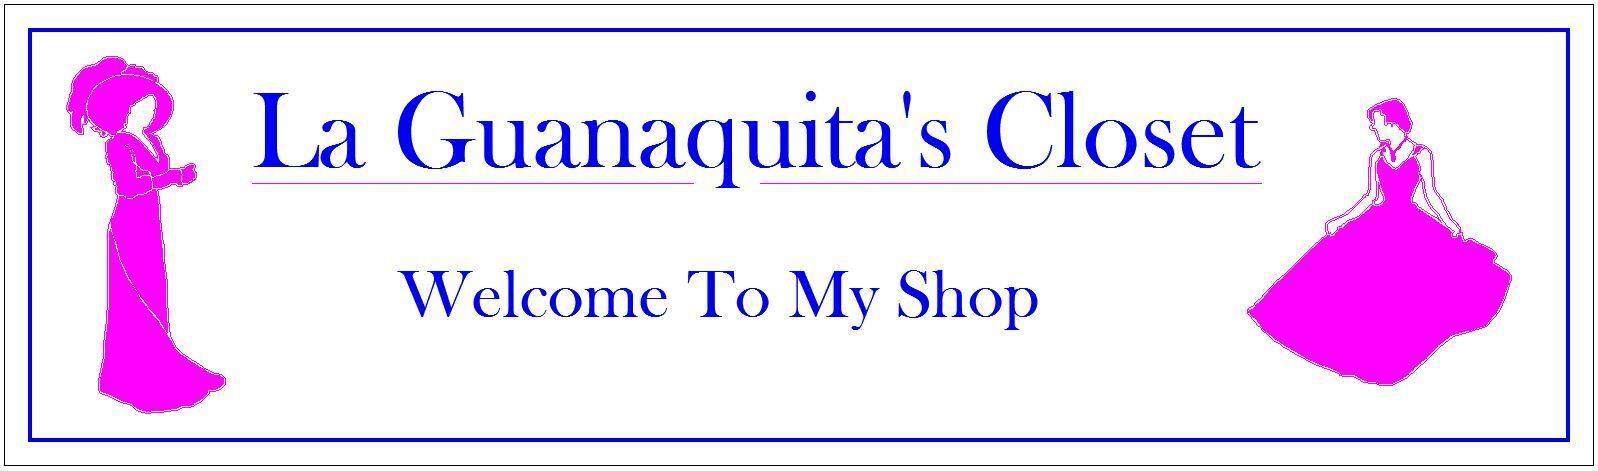 La Guanaquita s Closet